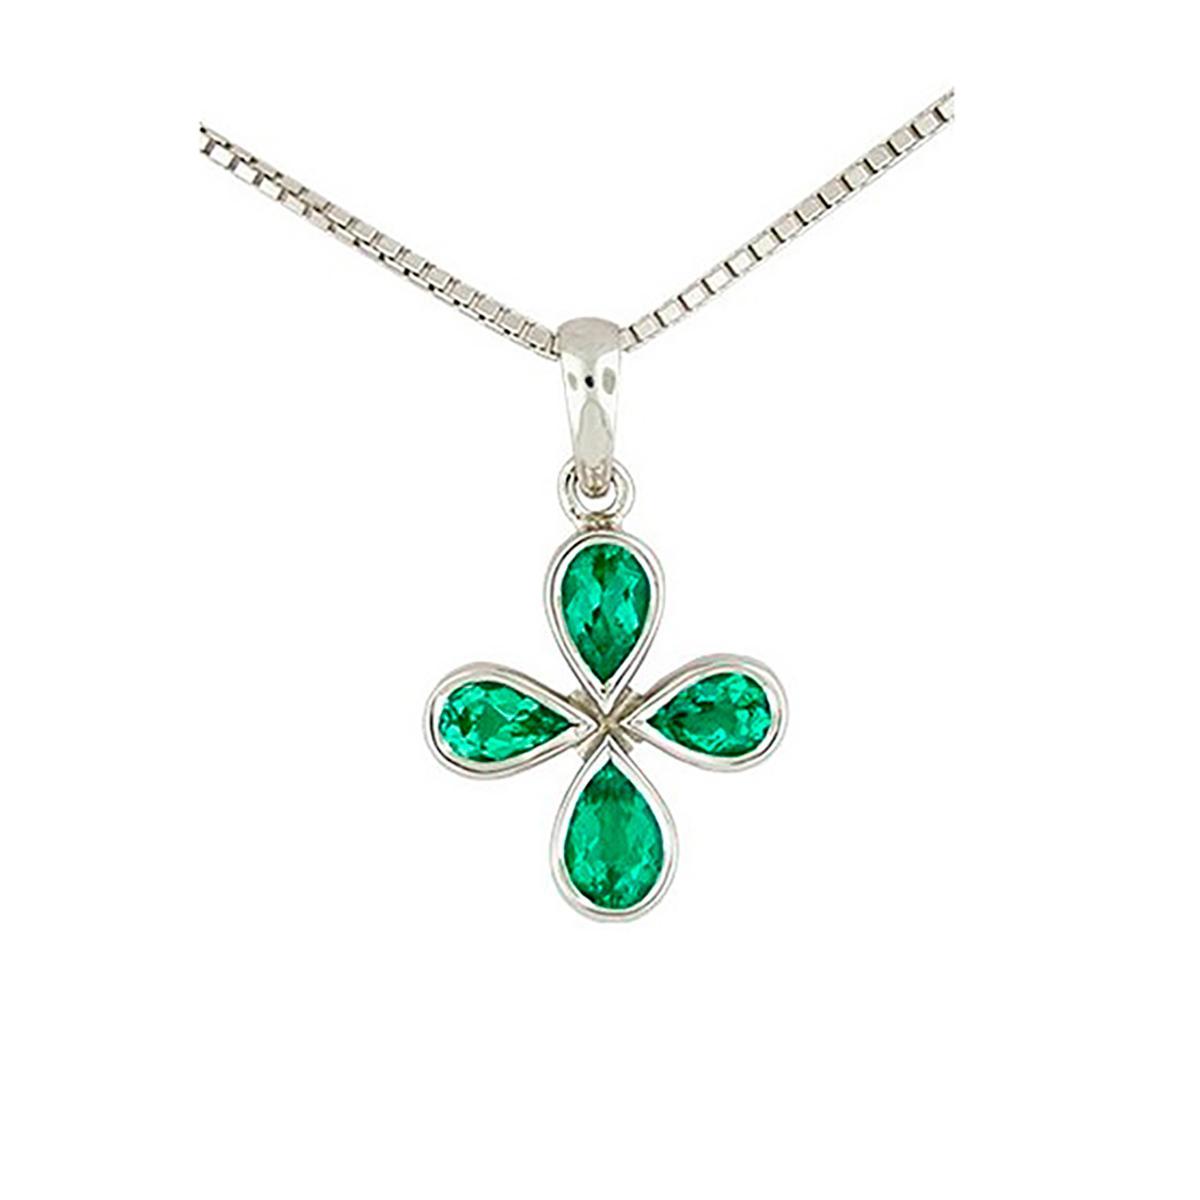 pear-shape-natural-emeralds-in-18k-white-gold-bezel-setting-emerald-pendant